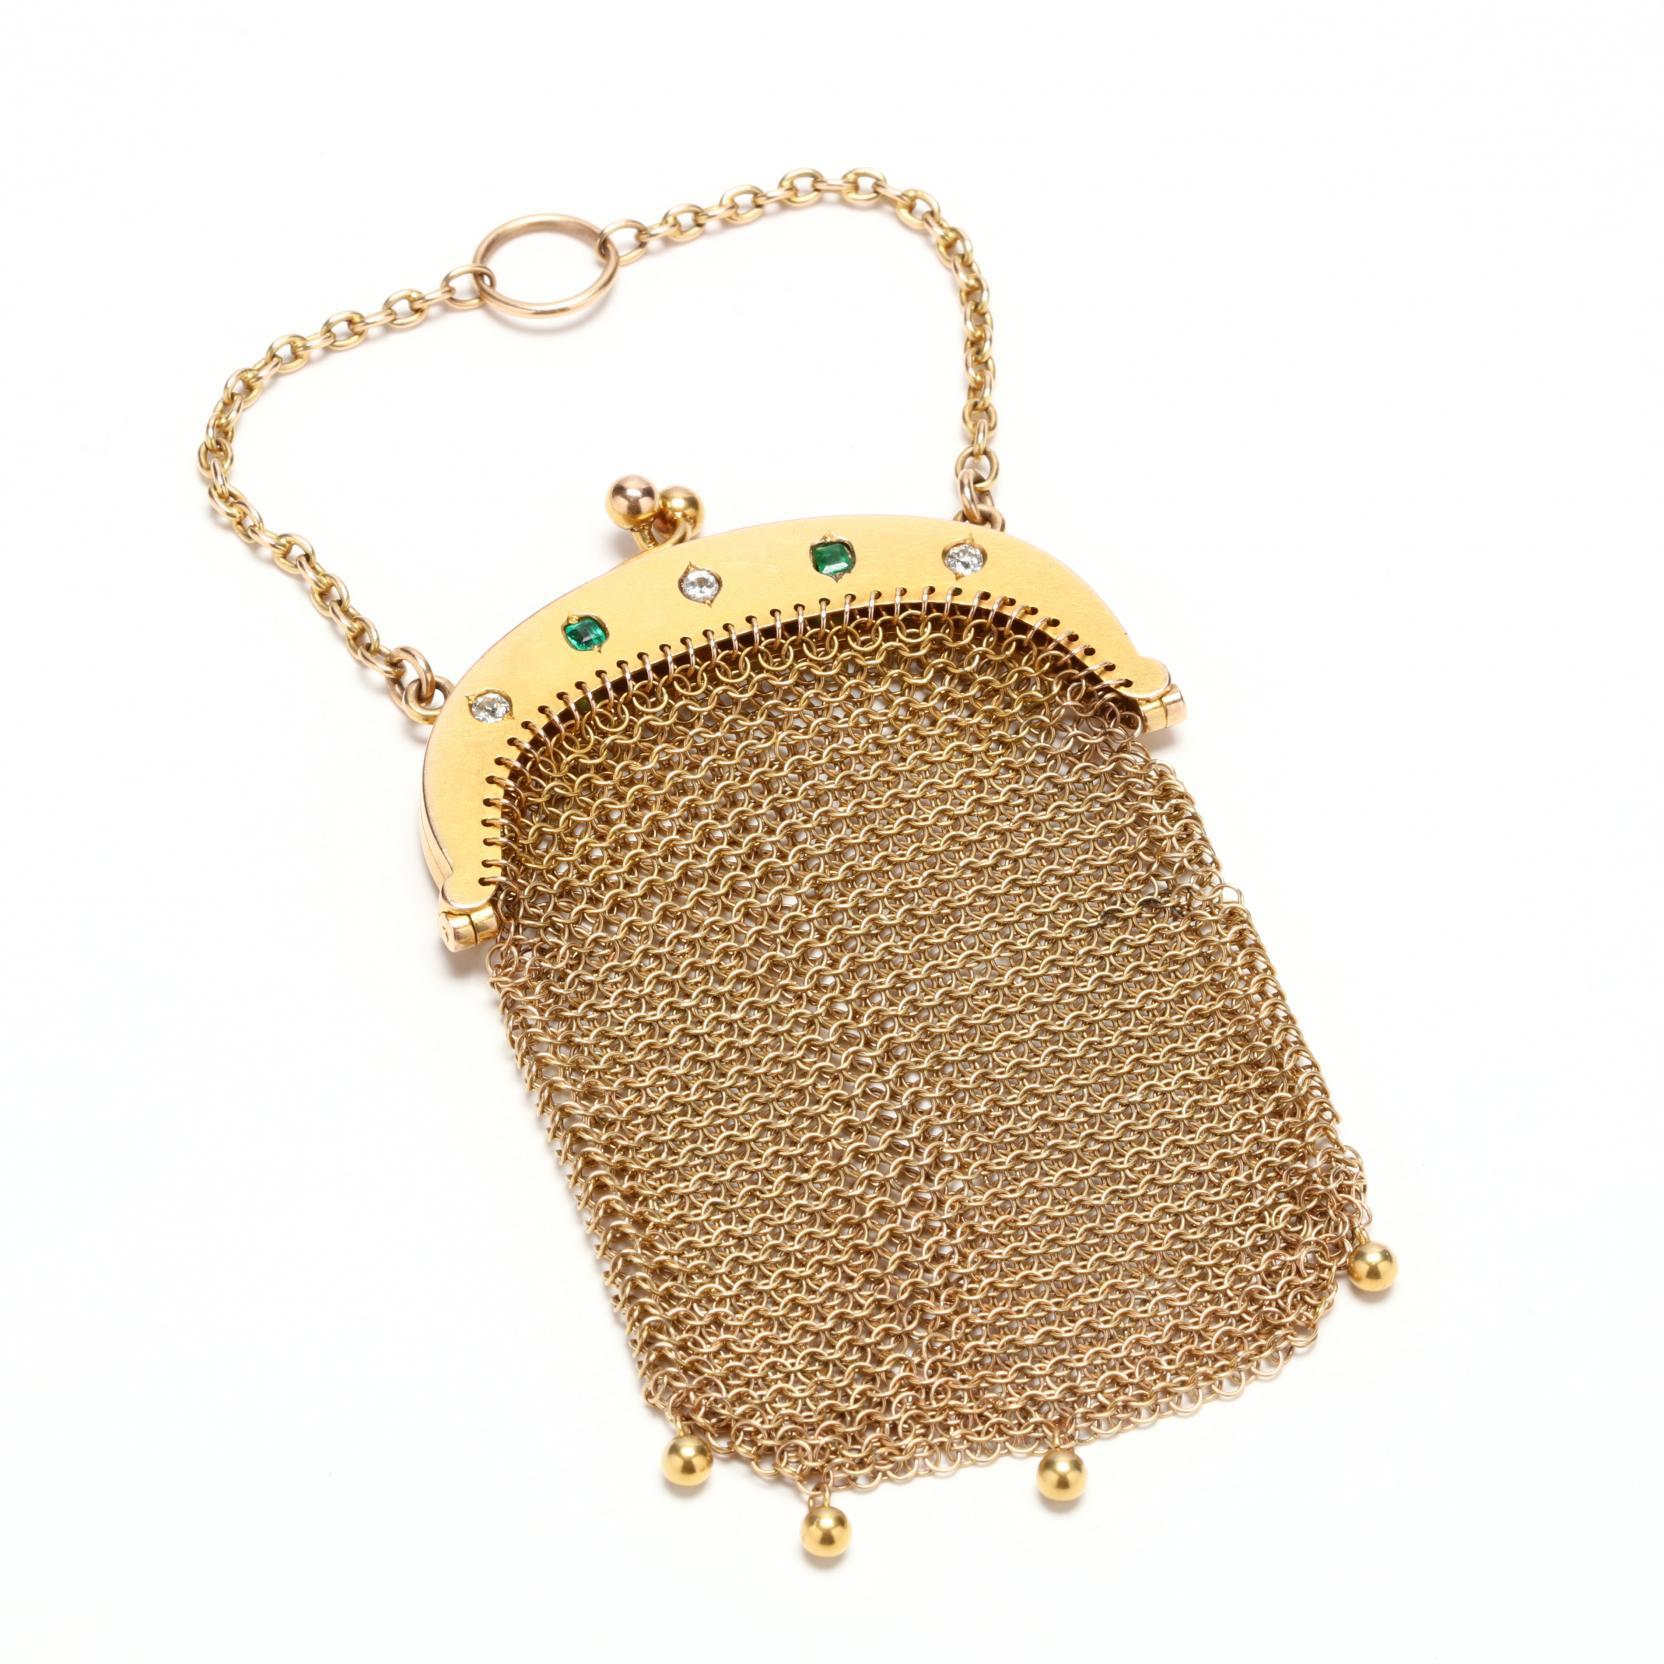 vintage-gold-and-gem-set-coin-purse